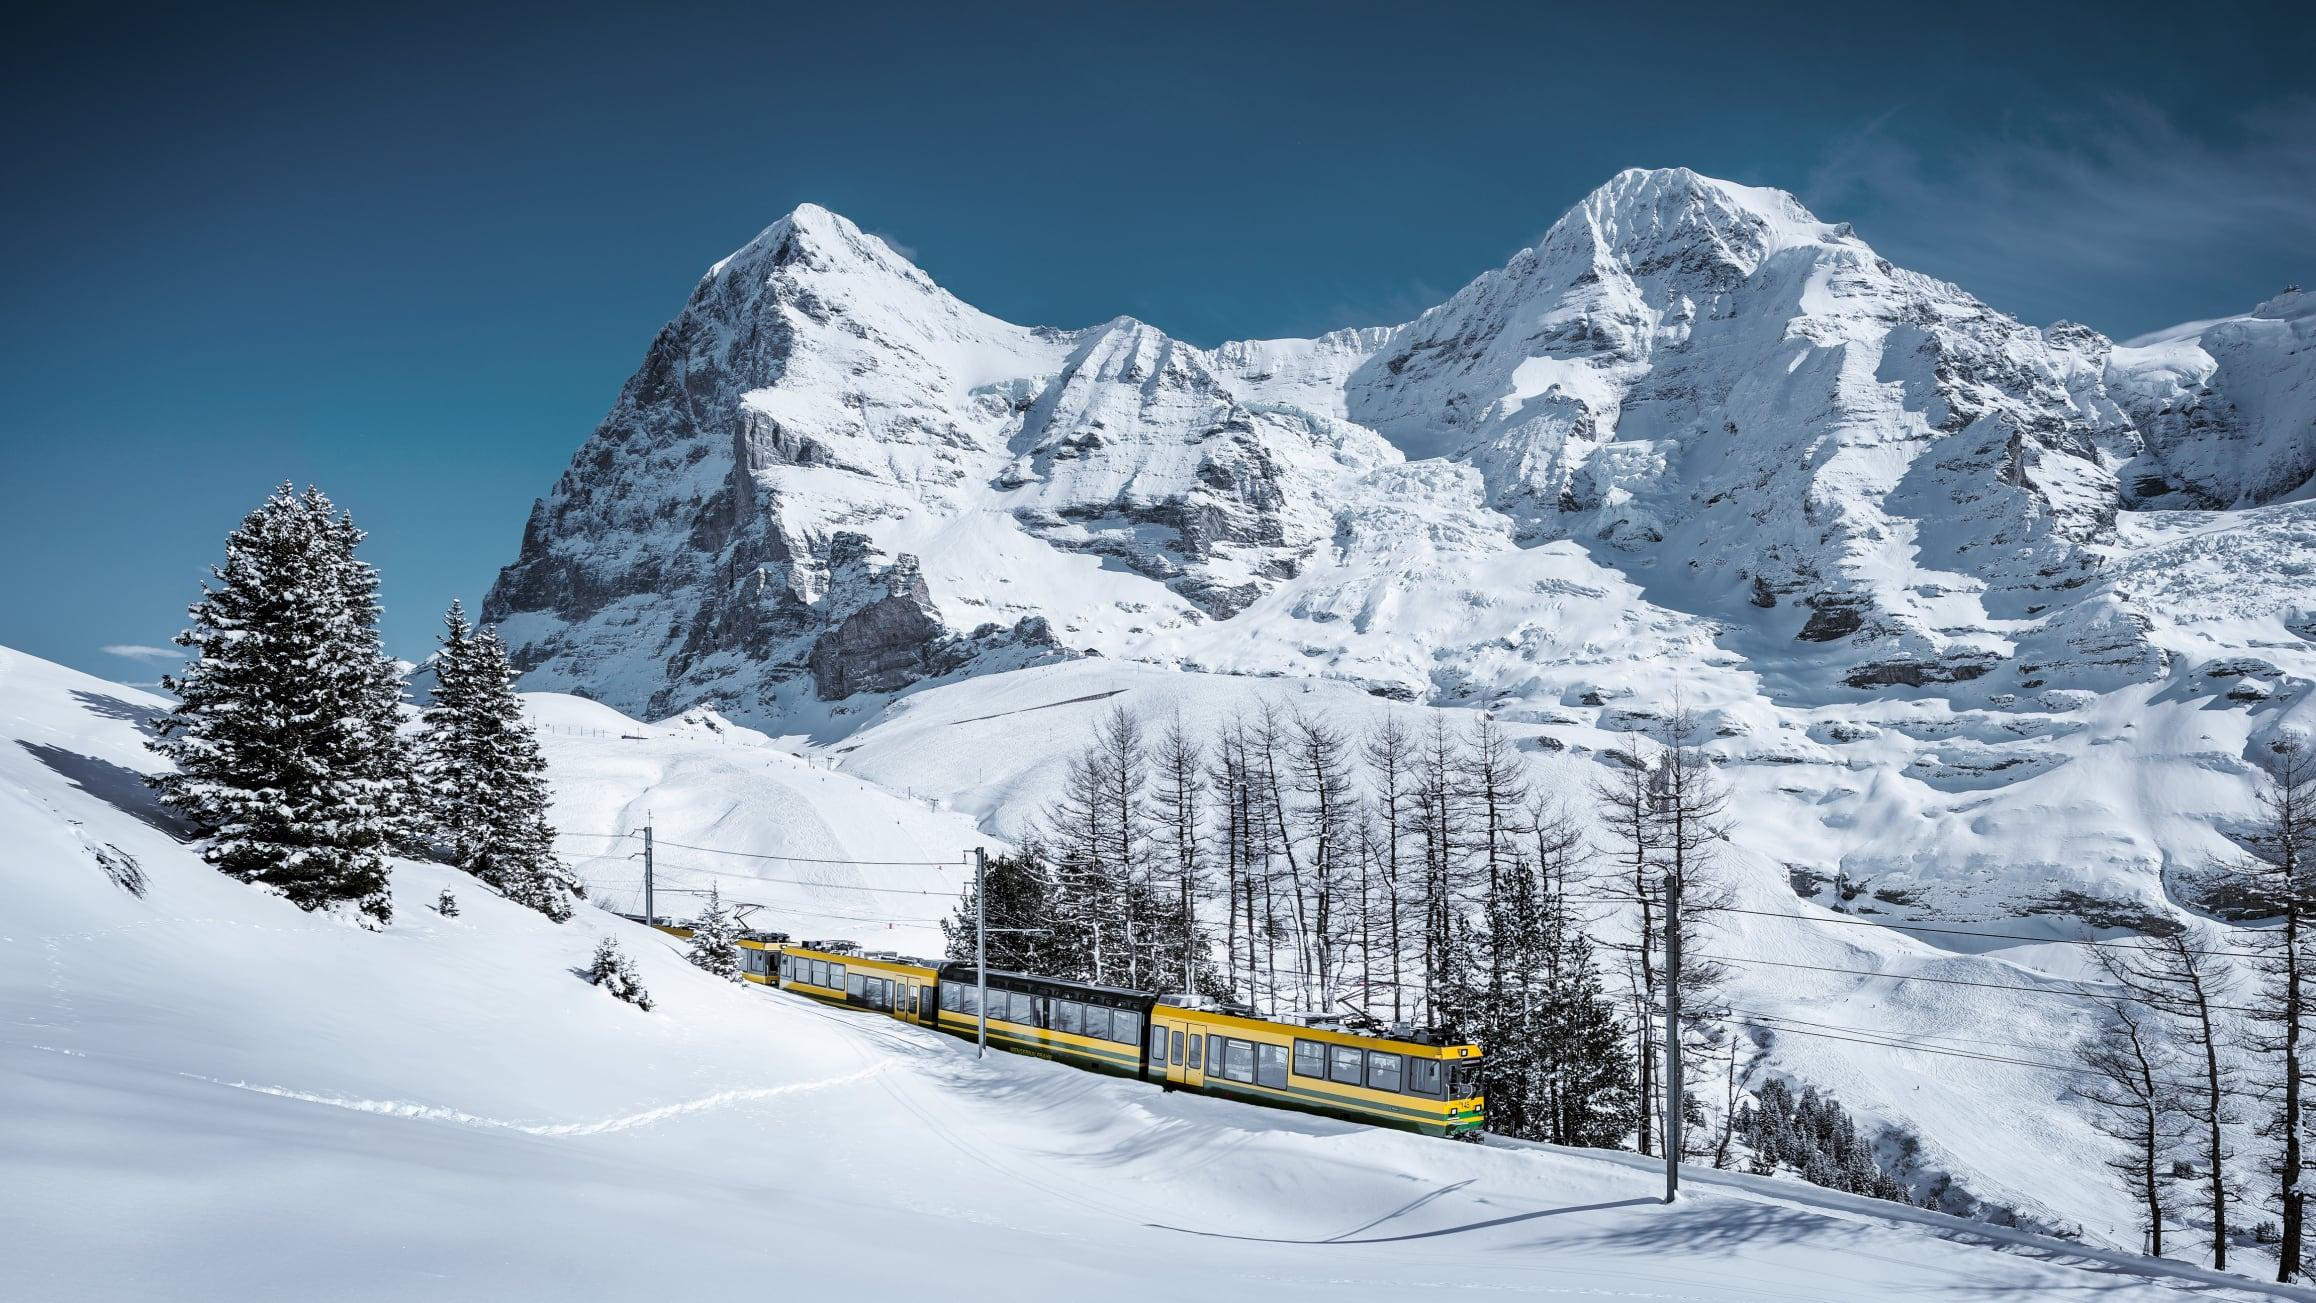 Wengernalpbahn eiger moench winter 01